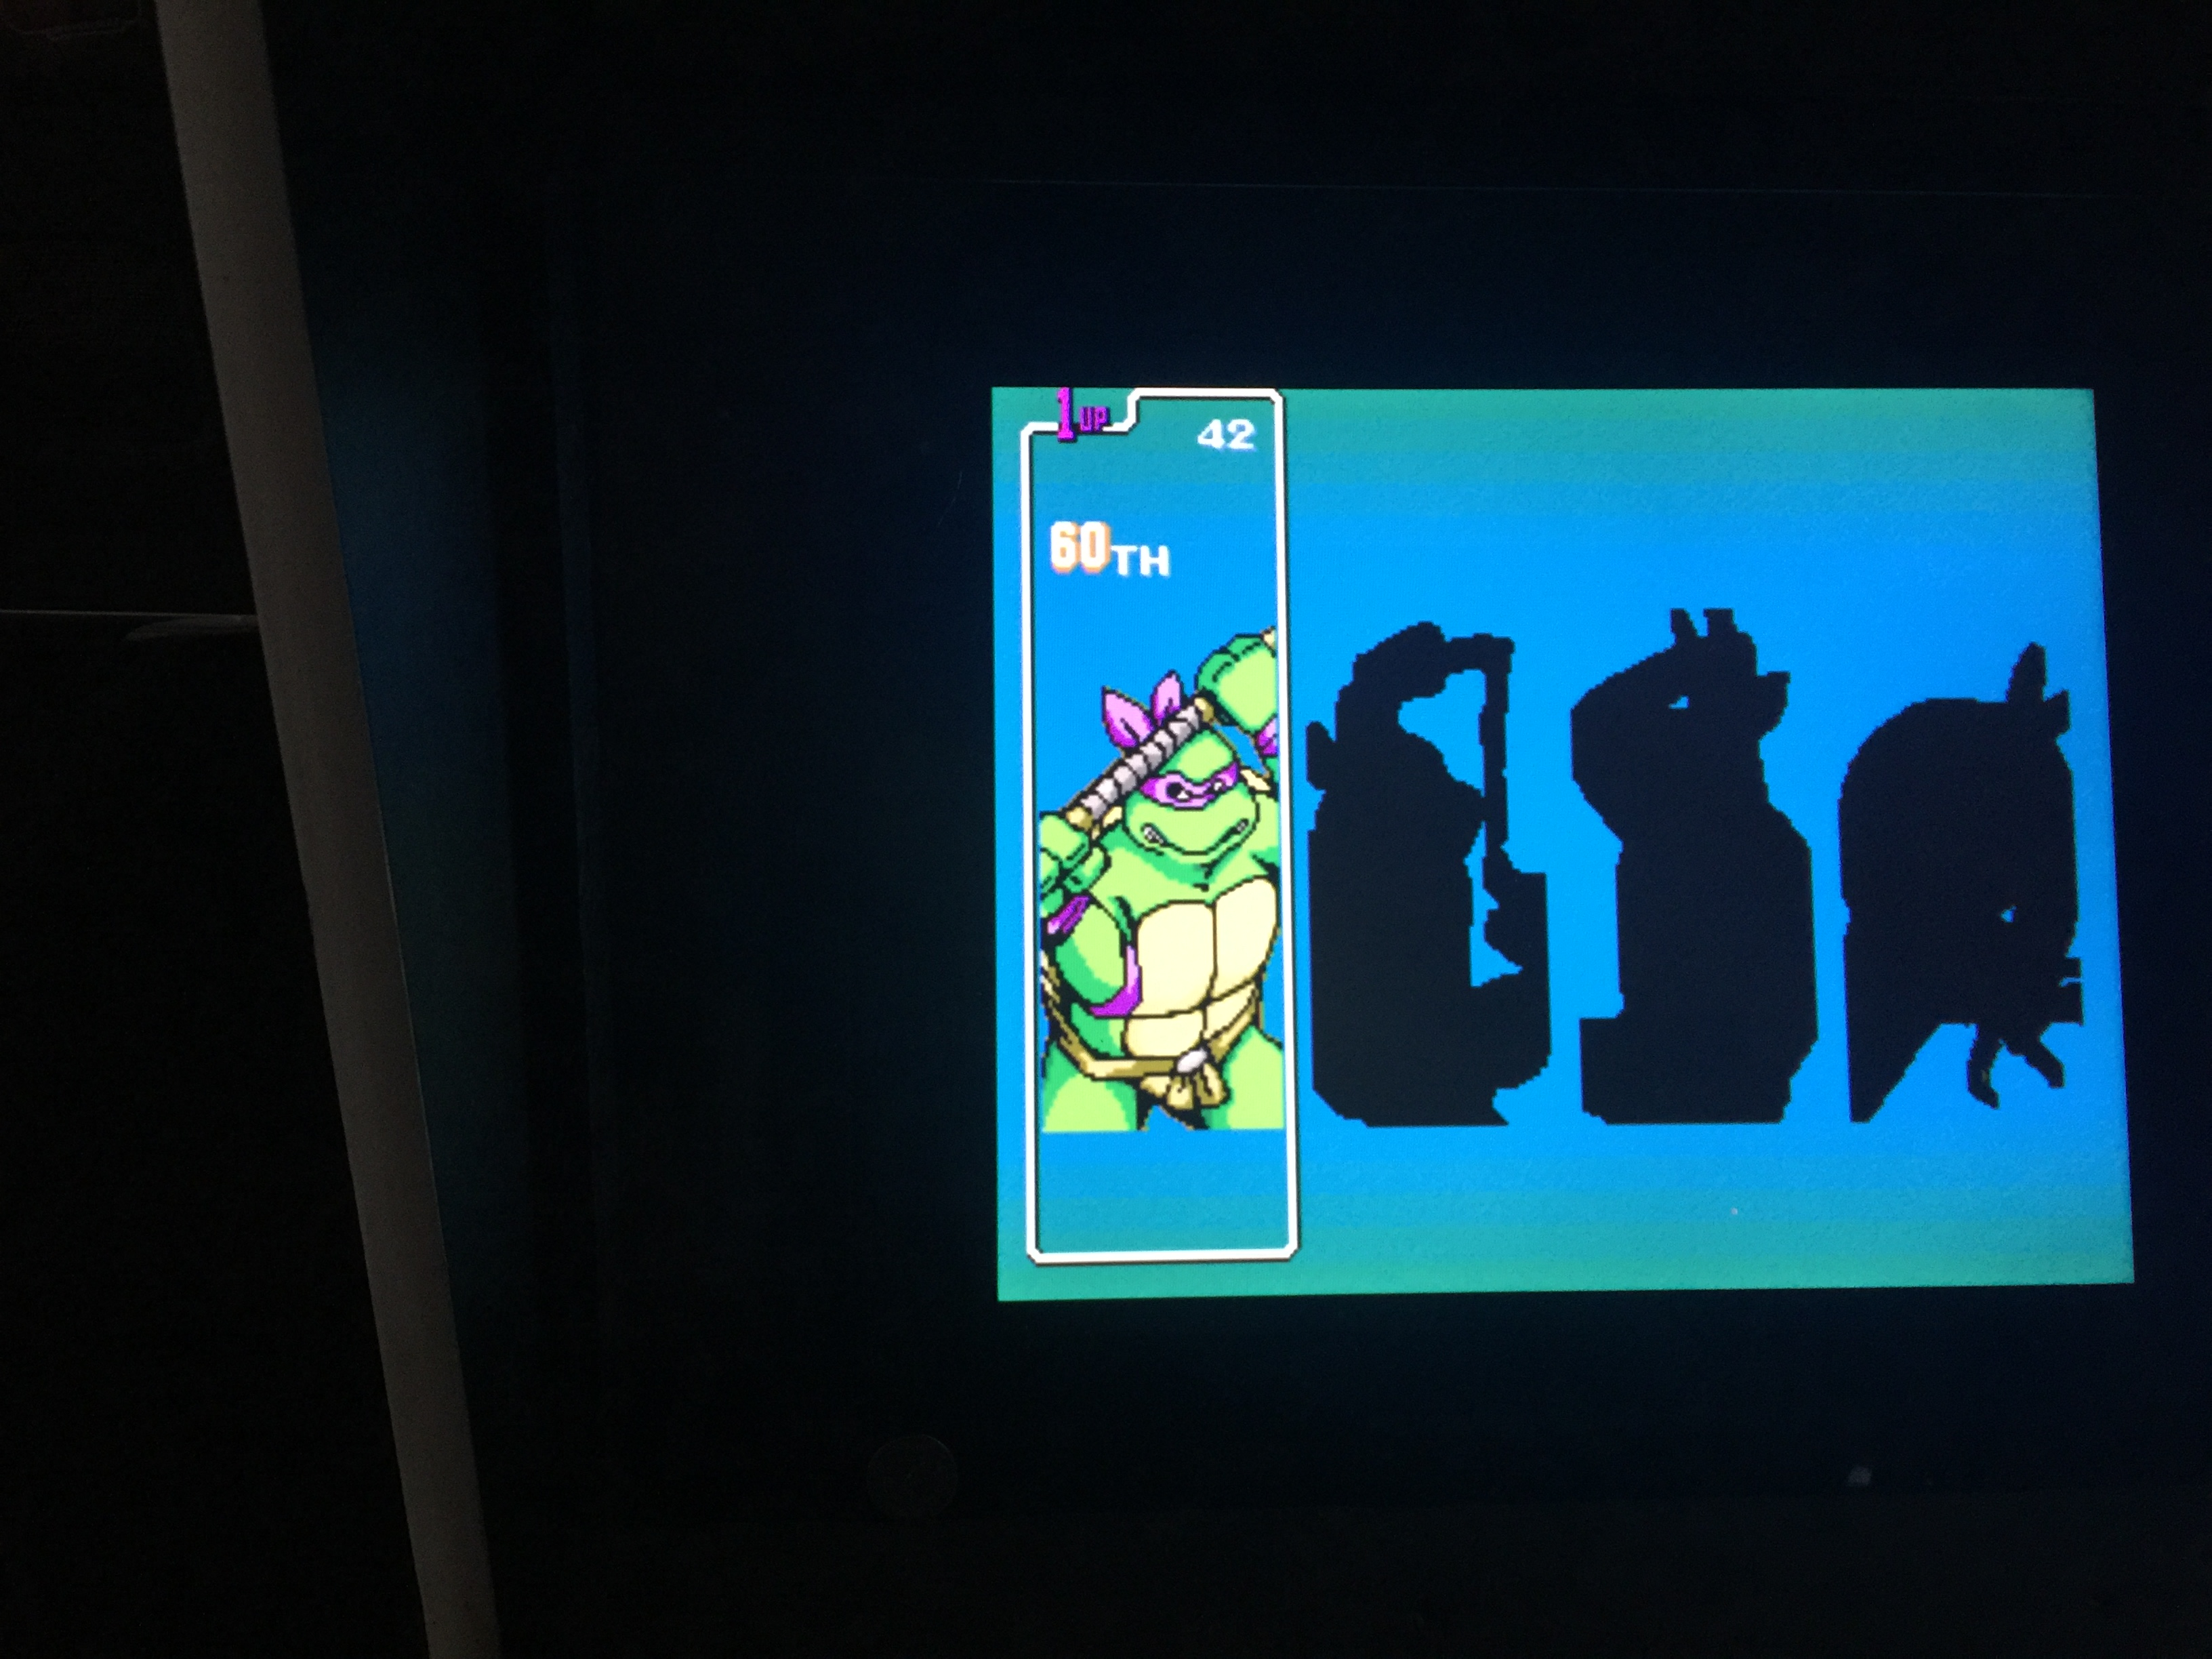 Teenage Mutant Hero Turtles 42 points